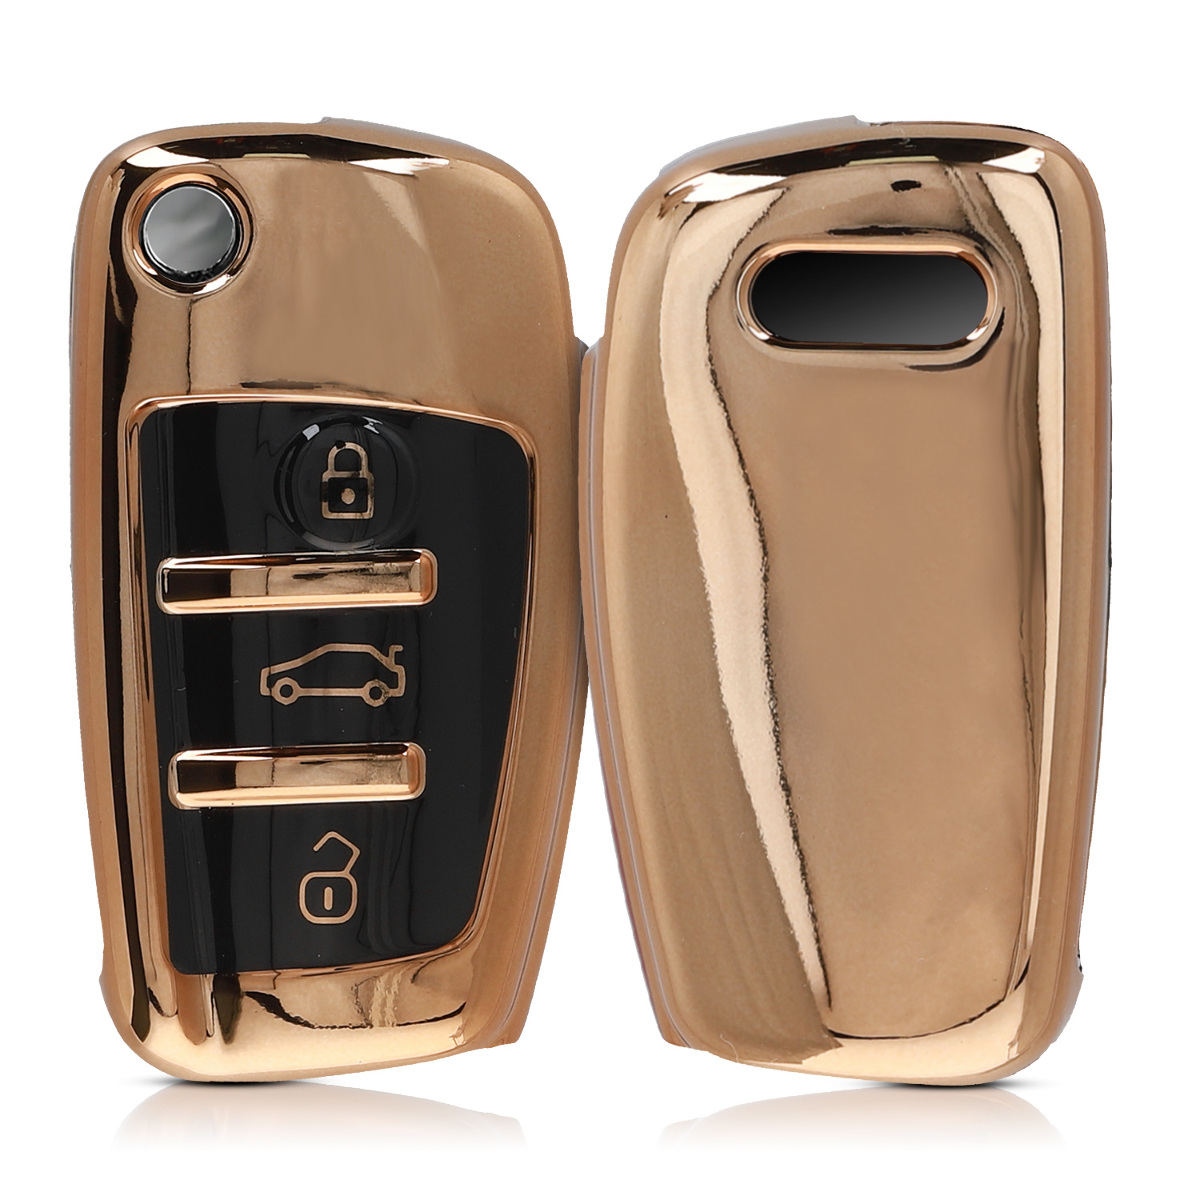 KW Θήκη Κλειδιού Audi - Σιλικόνη - 3 Κουμπιά - Gold High Gloss (48038.92)